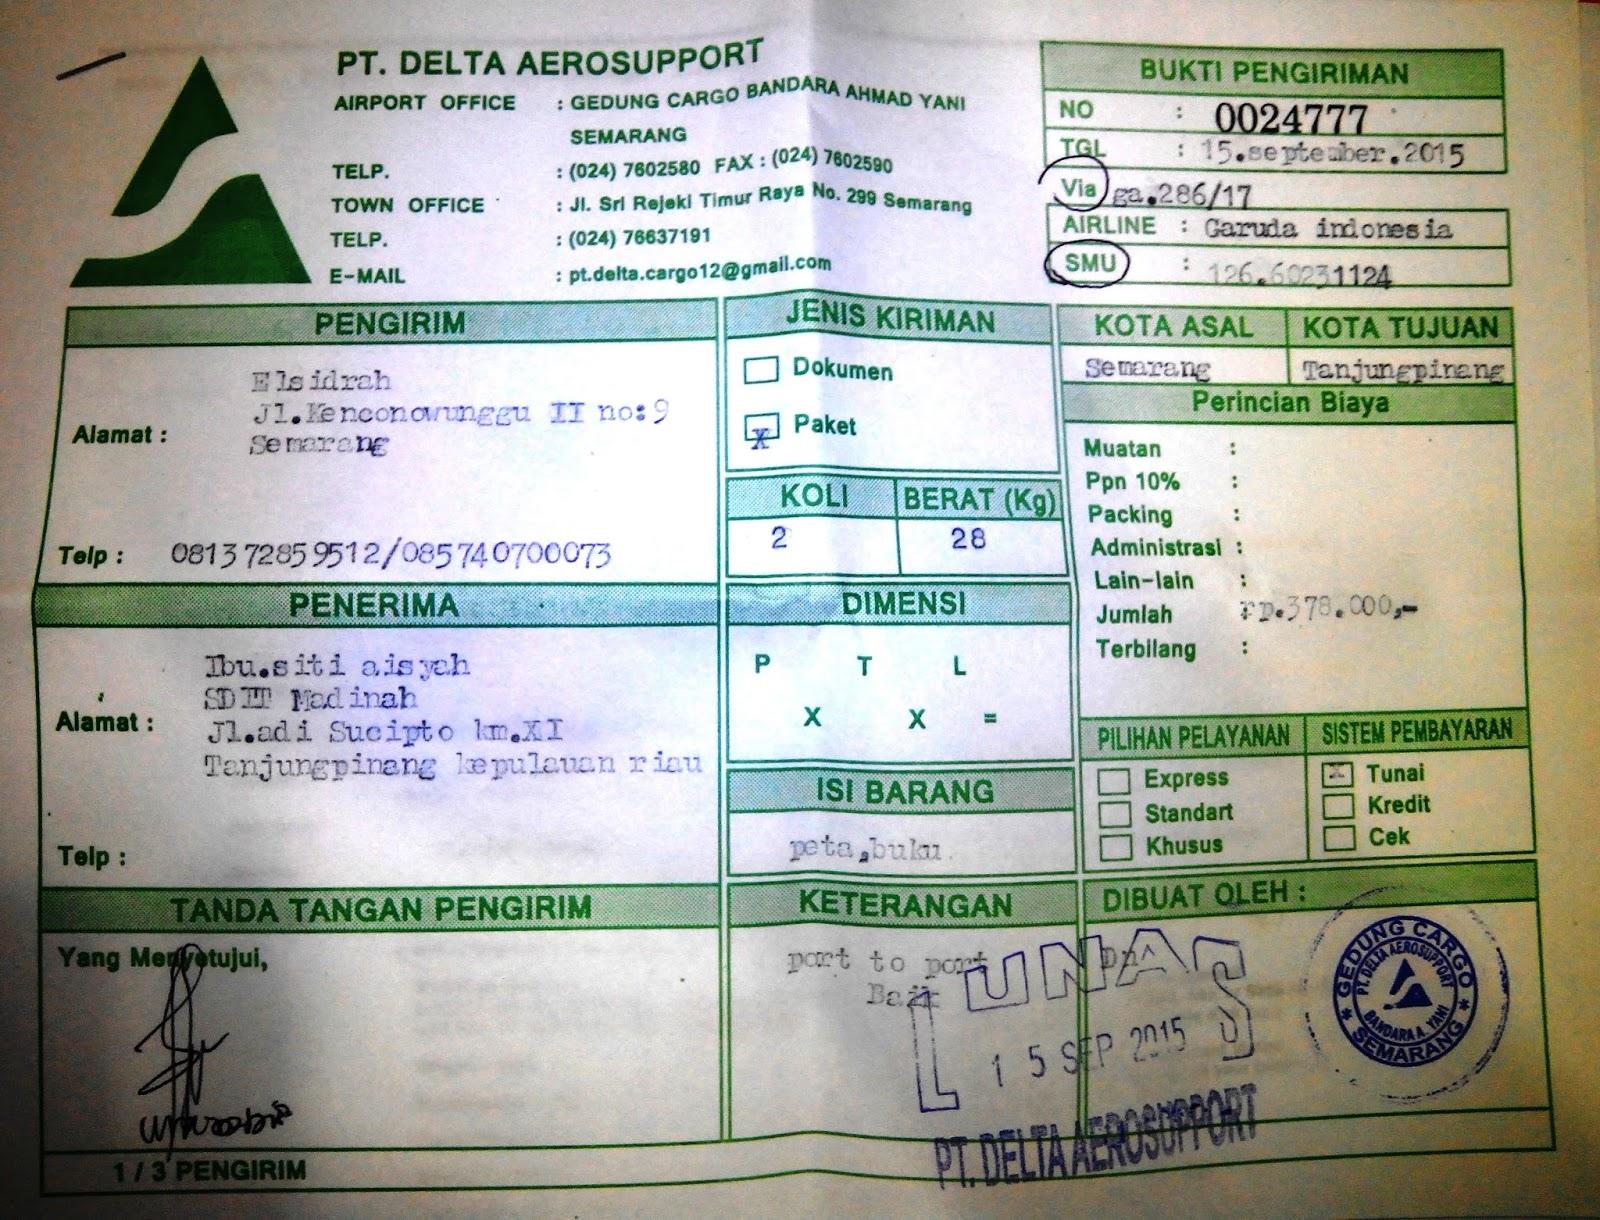 Katalog Bazar Jarum Pentul Keping Delta Cargo